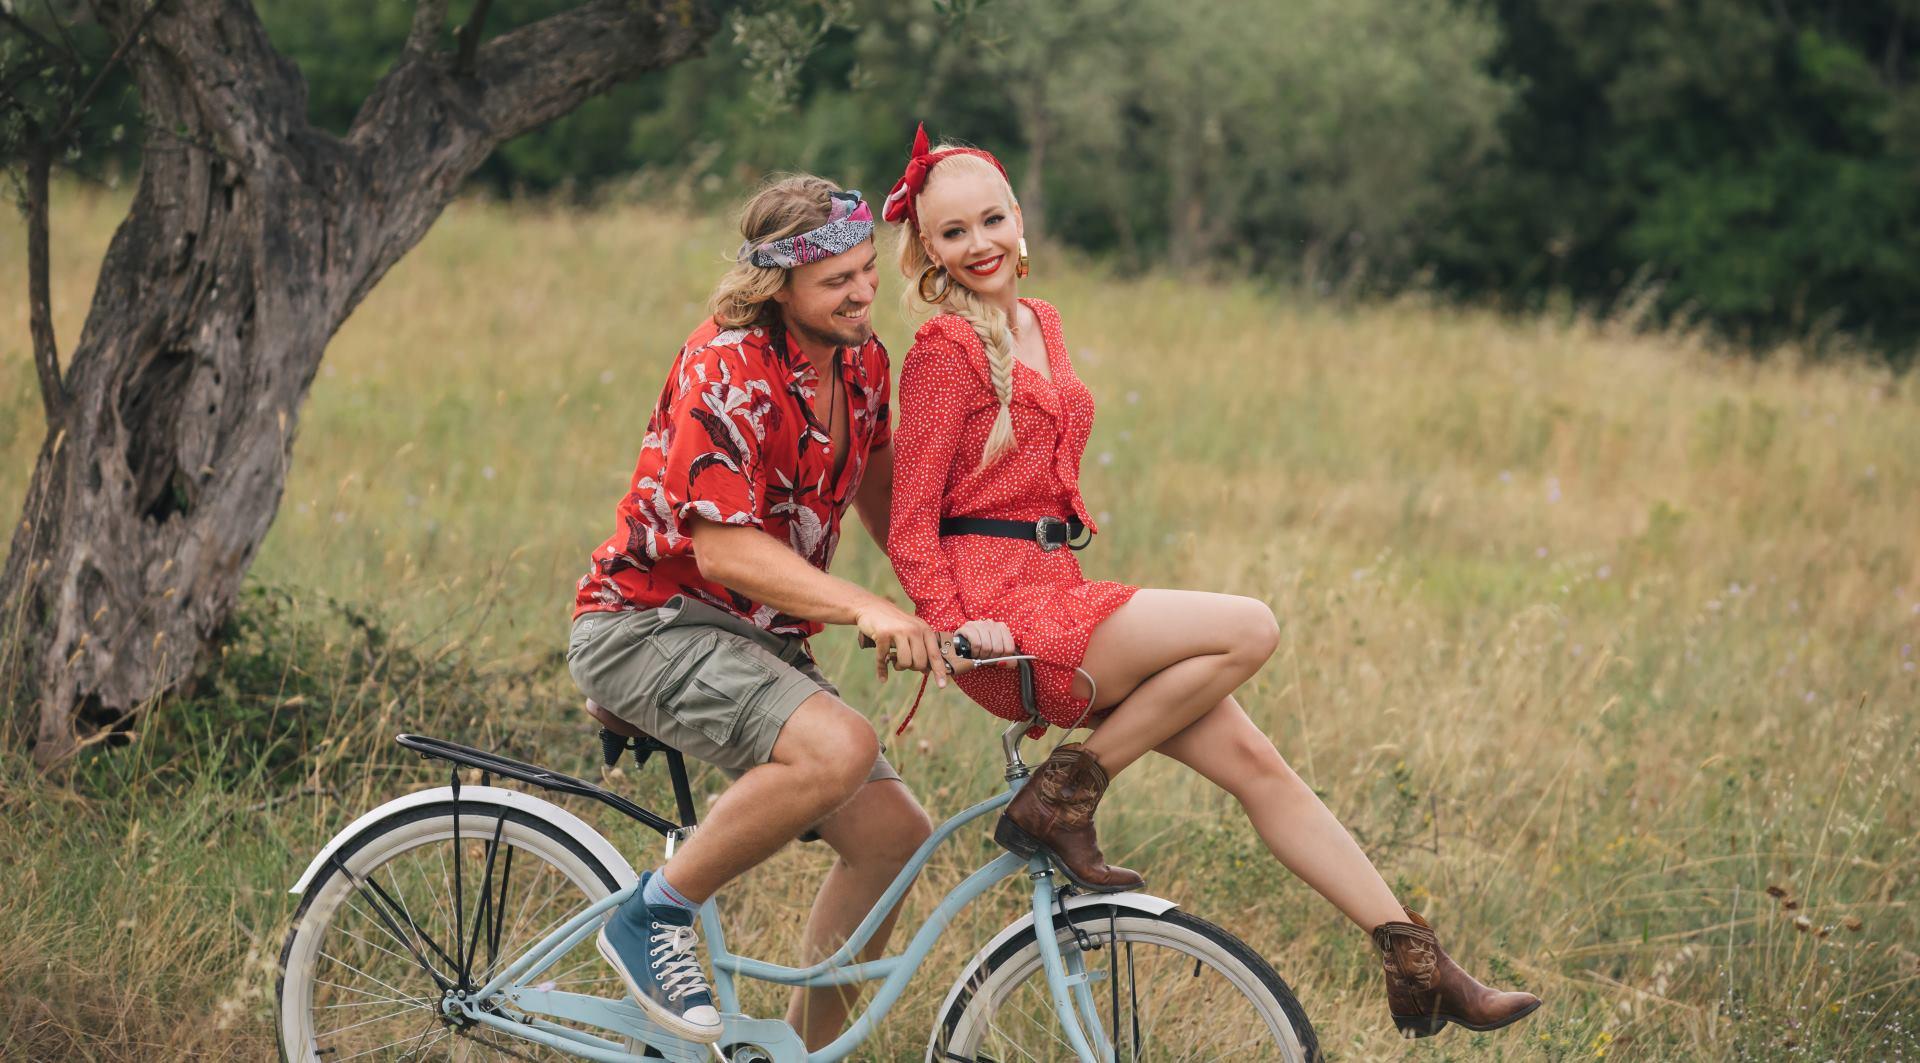 FOTO: VIDEO: Nova ljetna pjesma Jelene Rozge – 'Uzmem koliko mi daš'